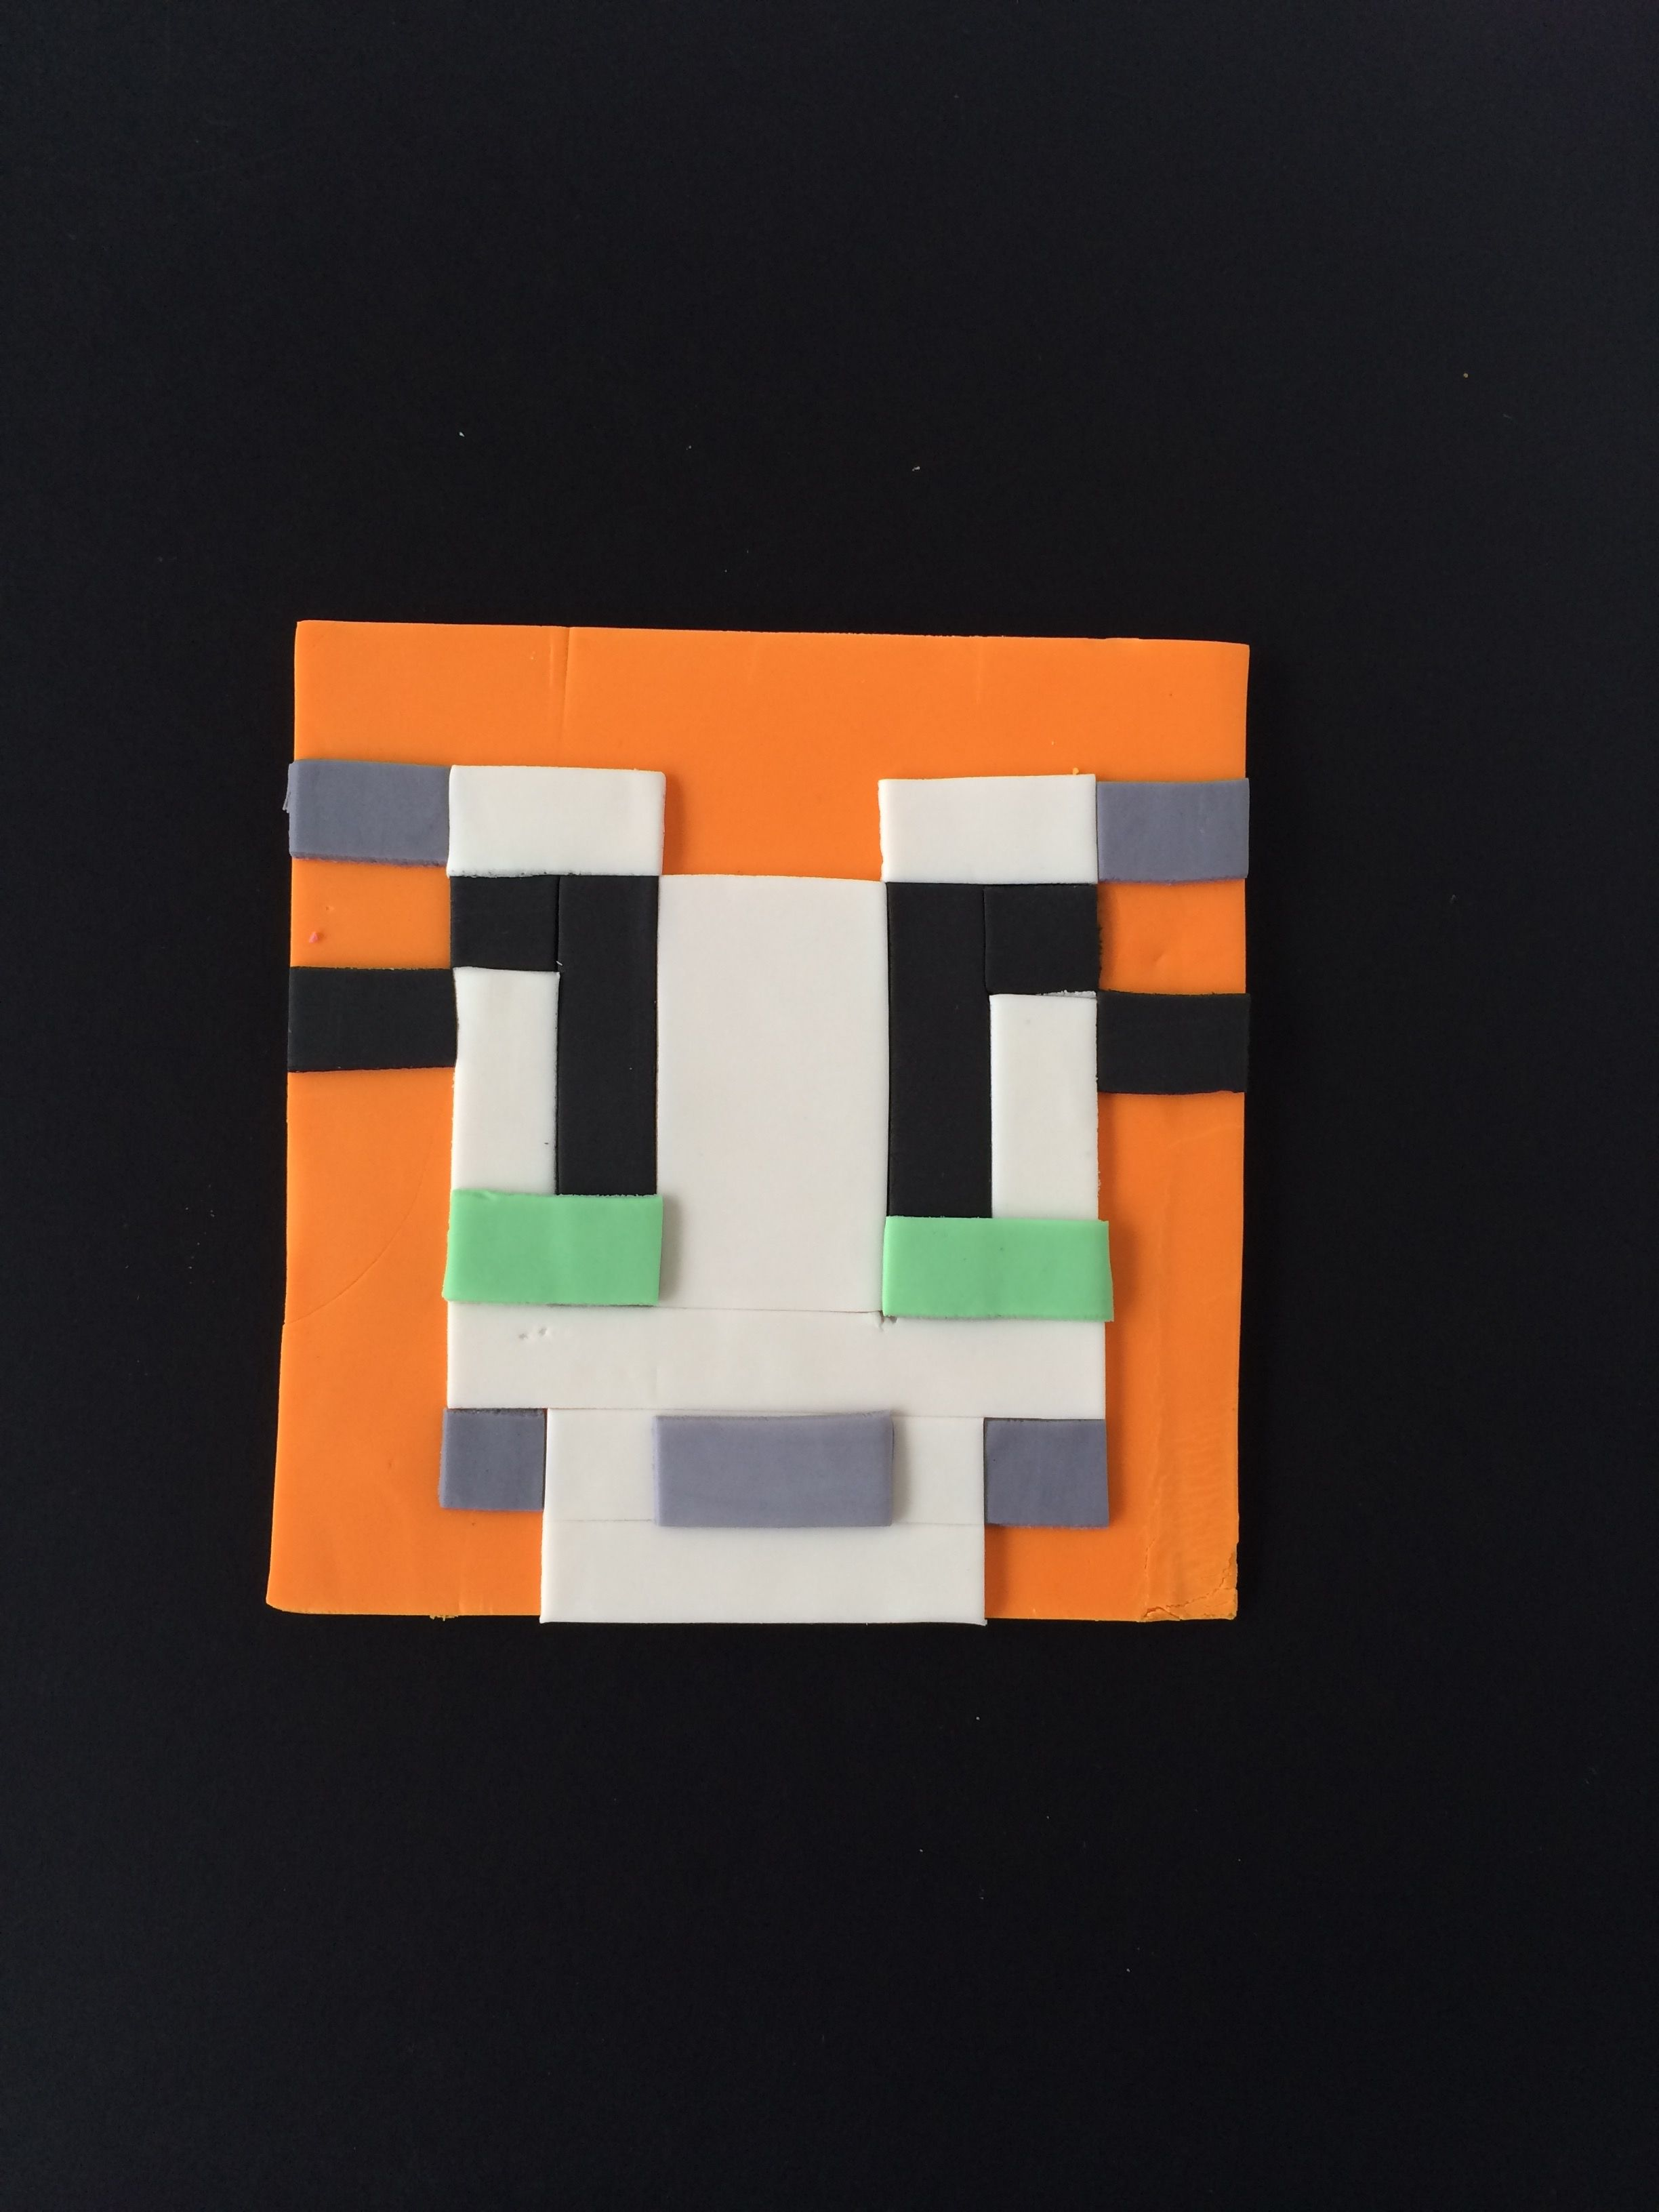 cake minecraft recipe. Custom Fondant Minecraft Stampy Cat Cake Topper Recipe